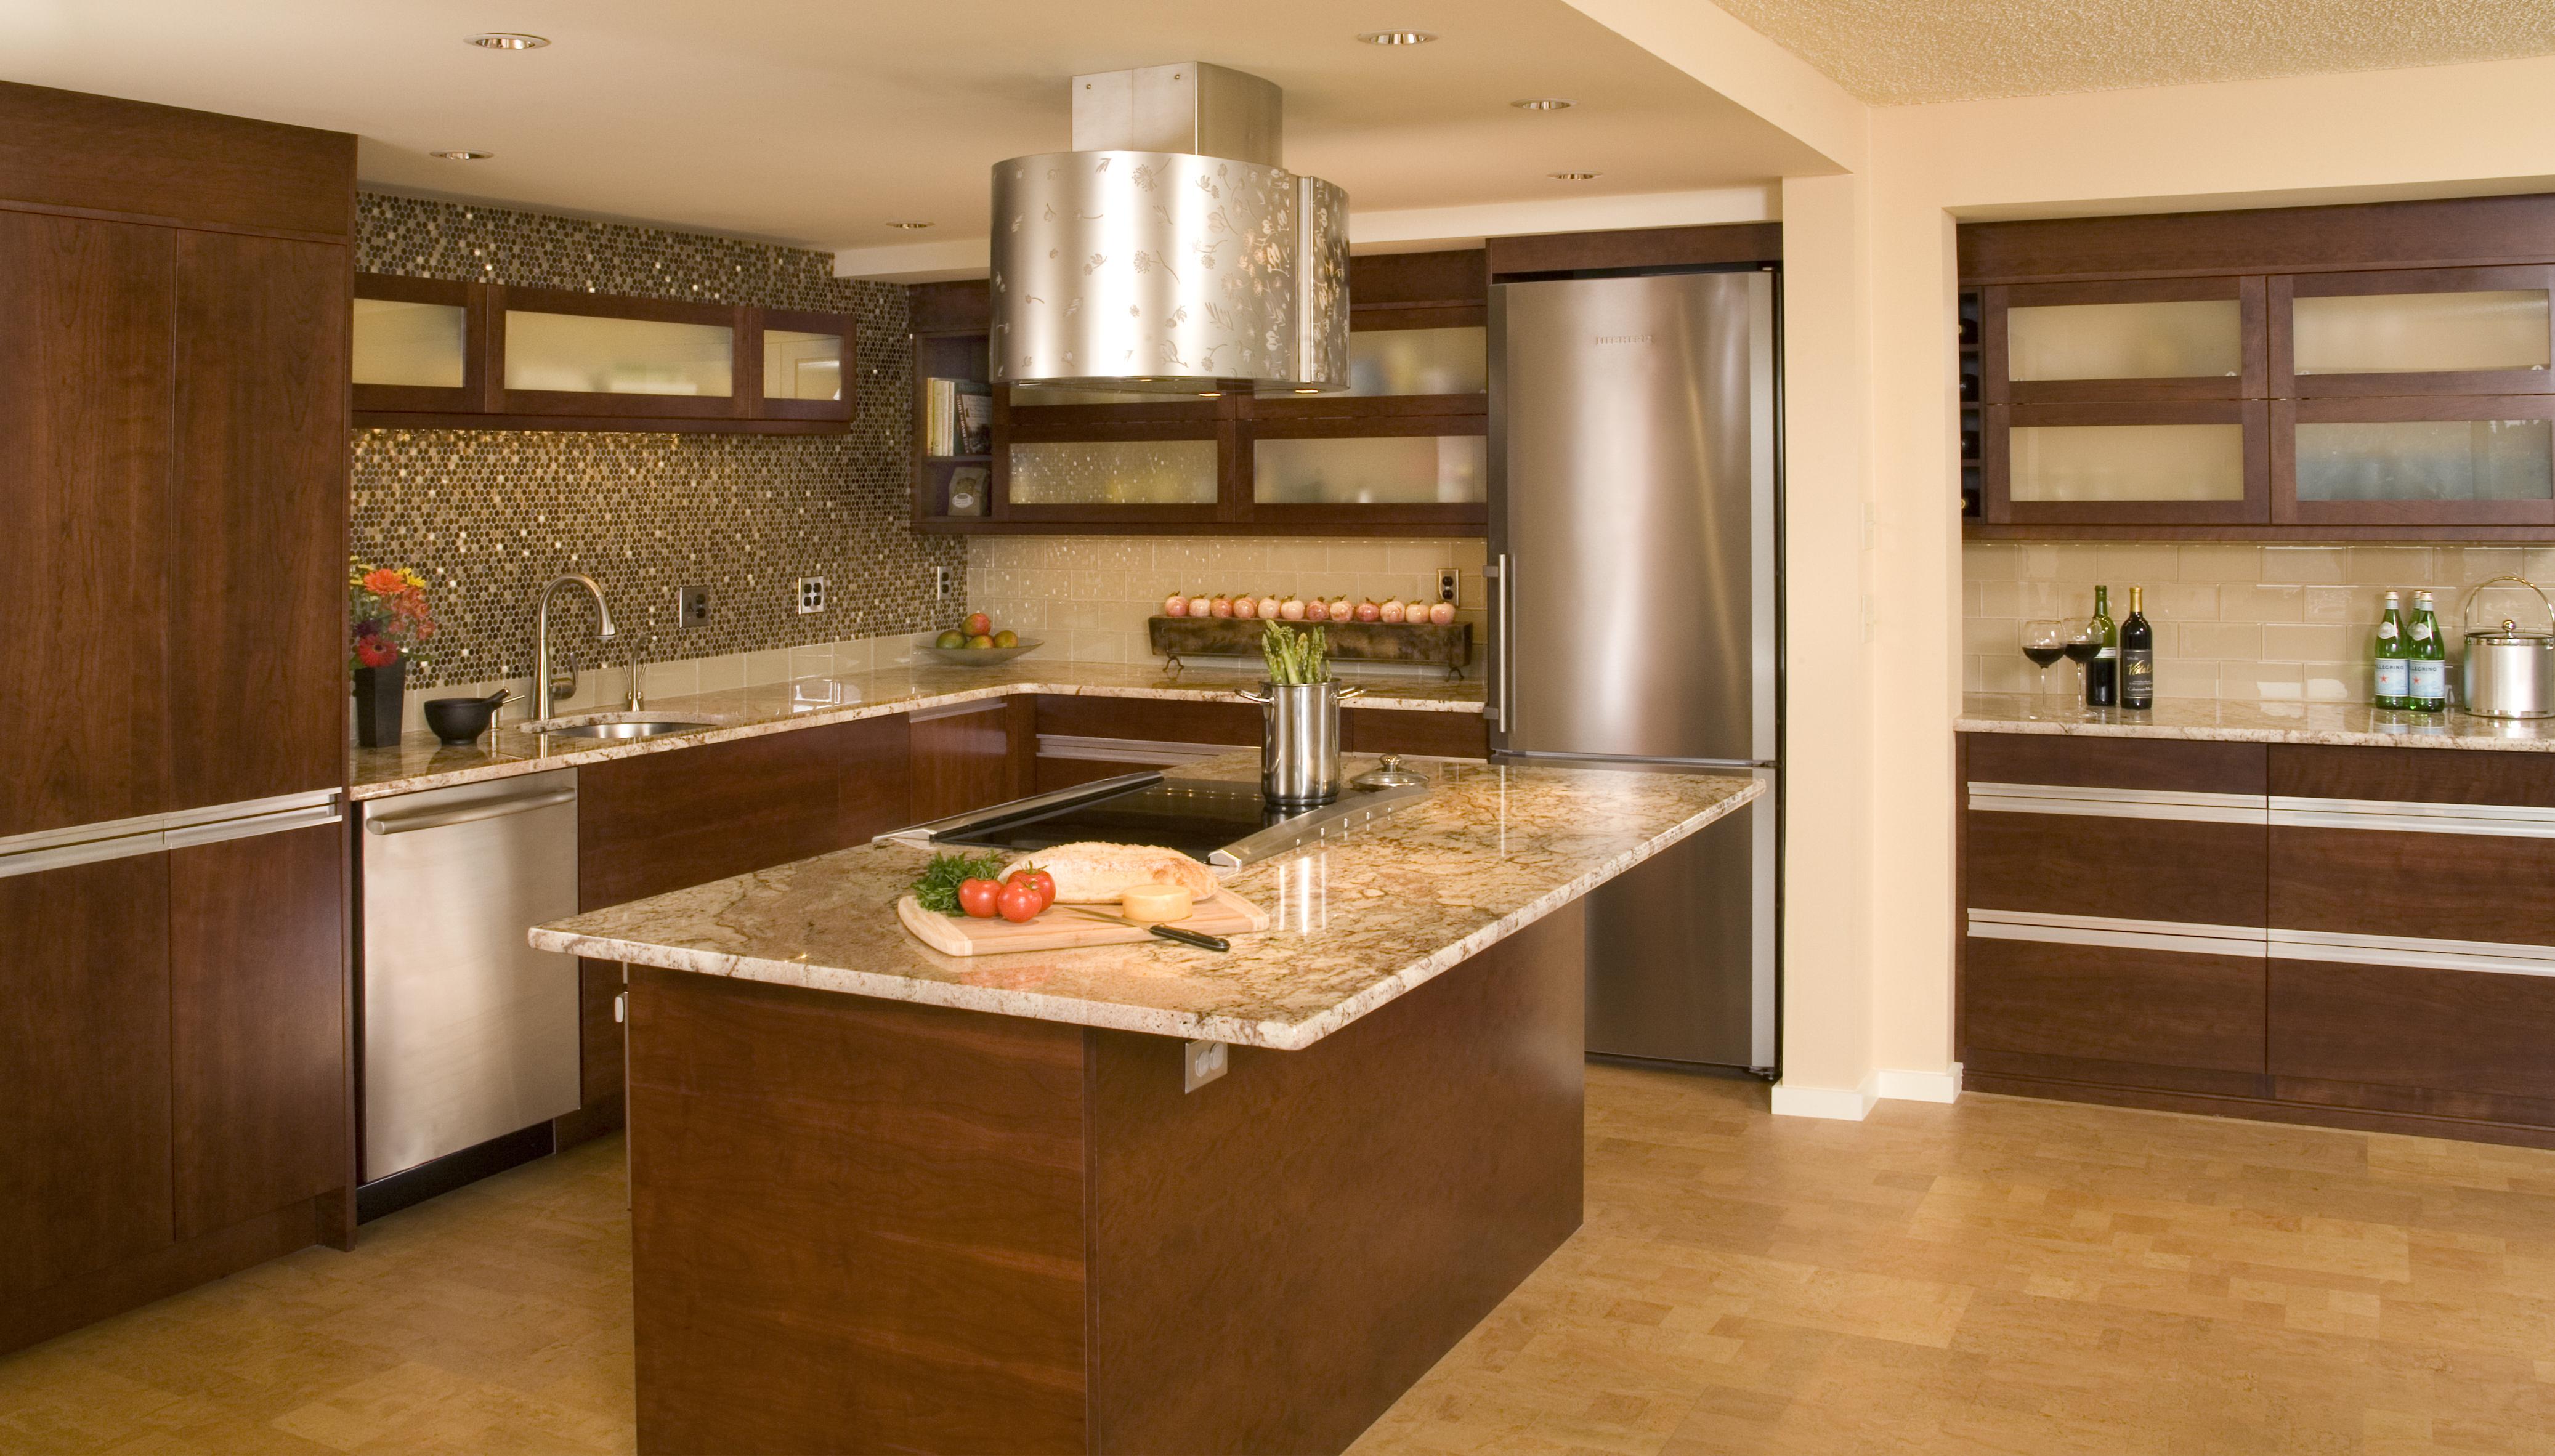 Award winning kitchen seattle design inspirations blog for Award winning kitchen designs